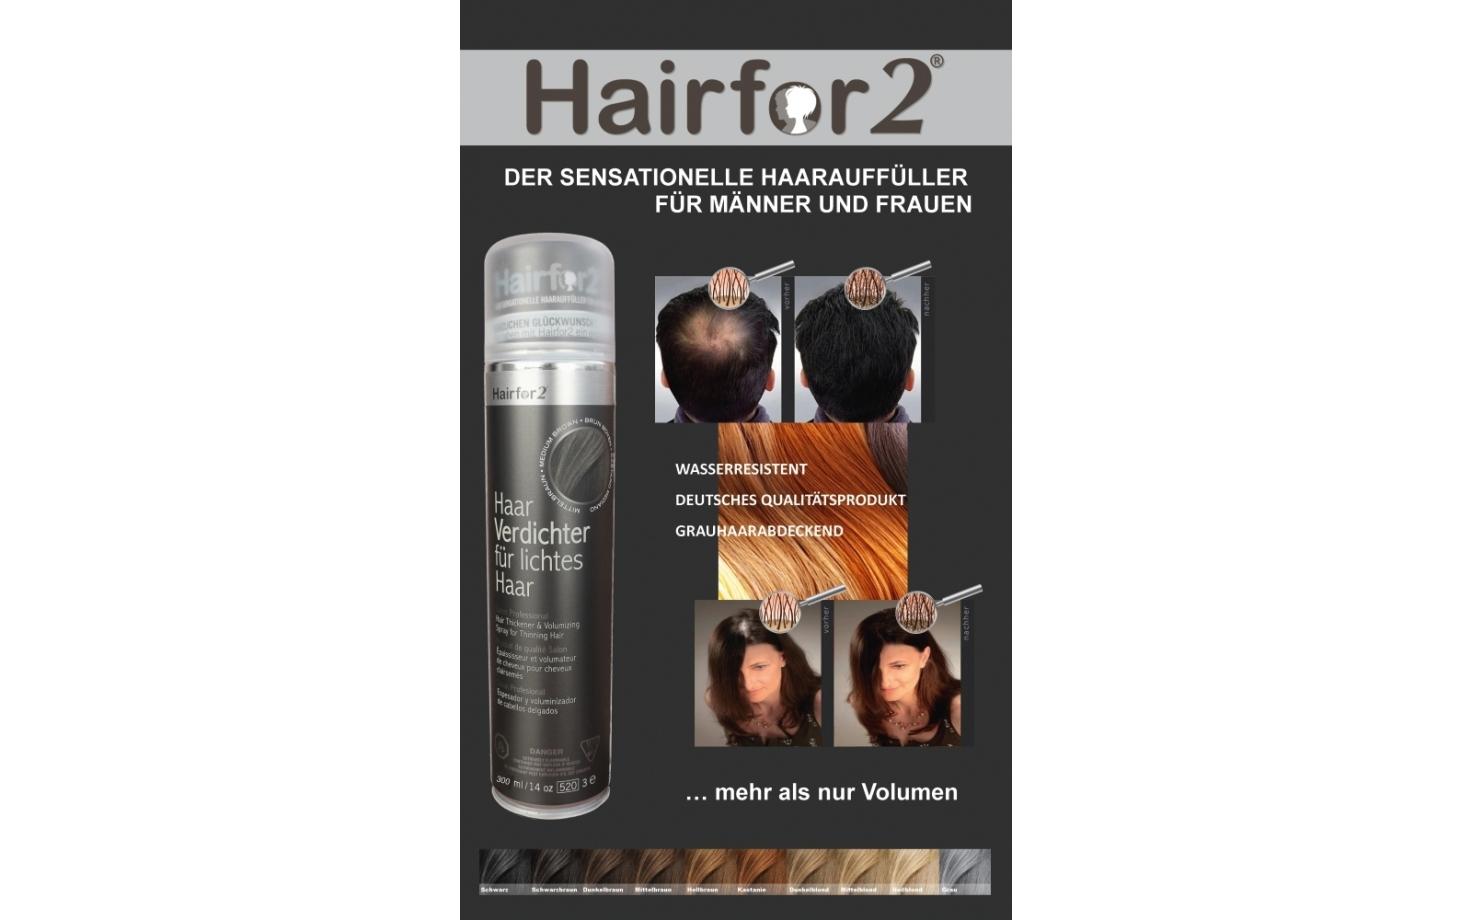 Hairfor2 Haarverdichtung Poster